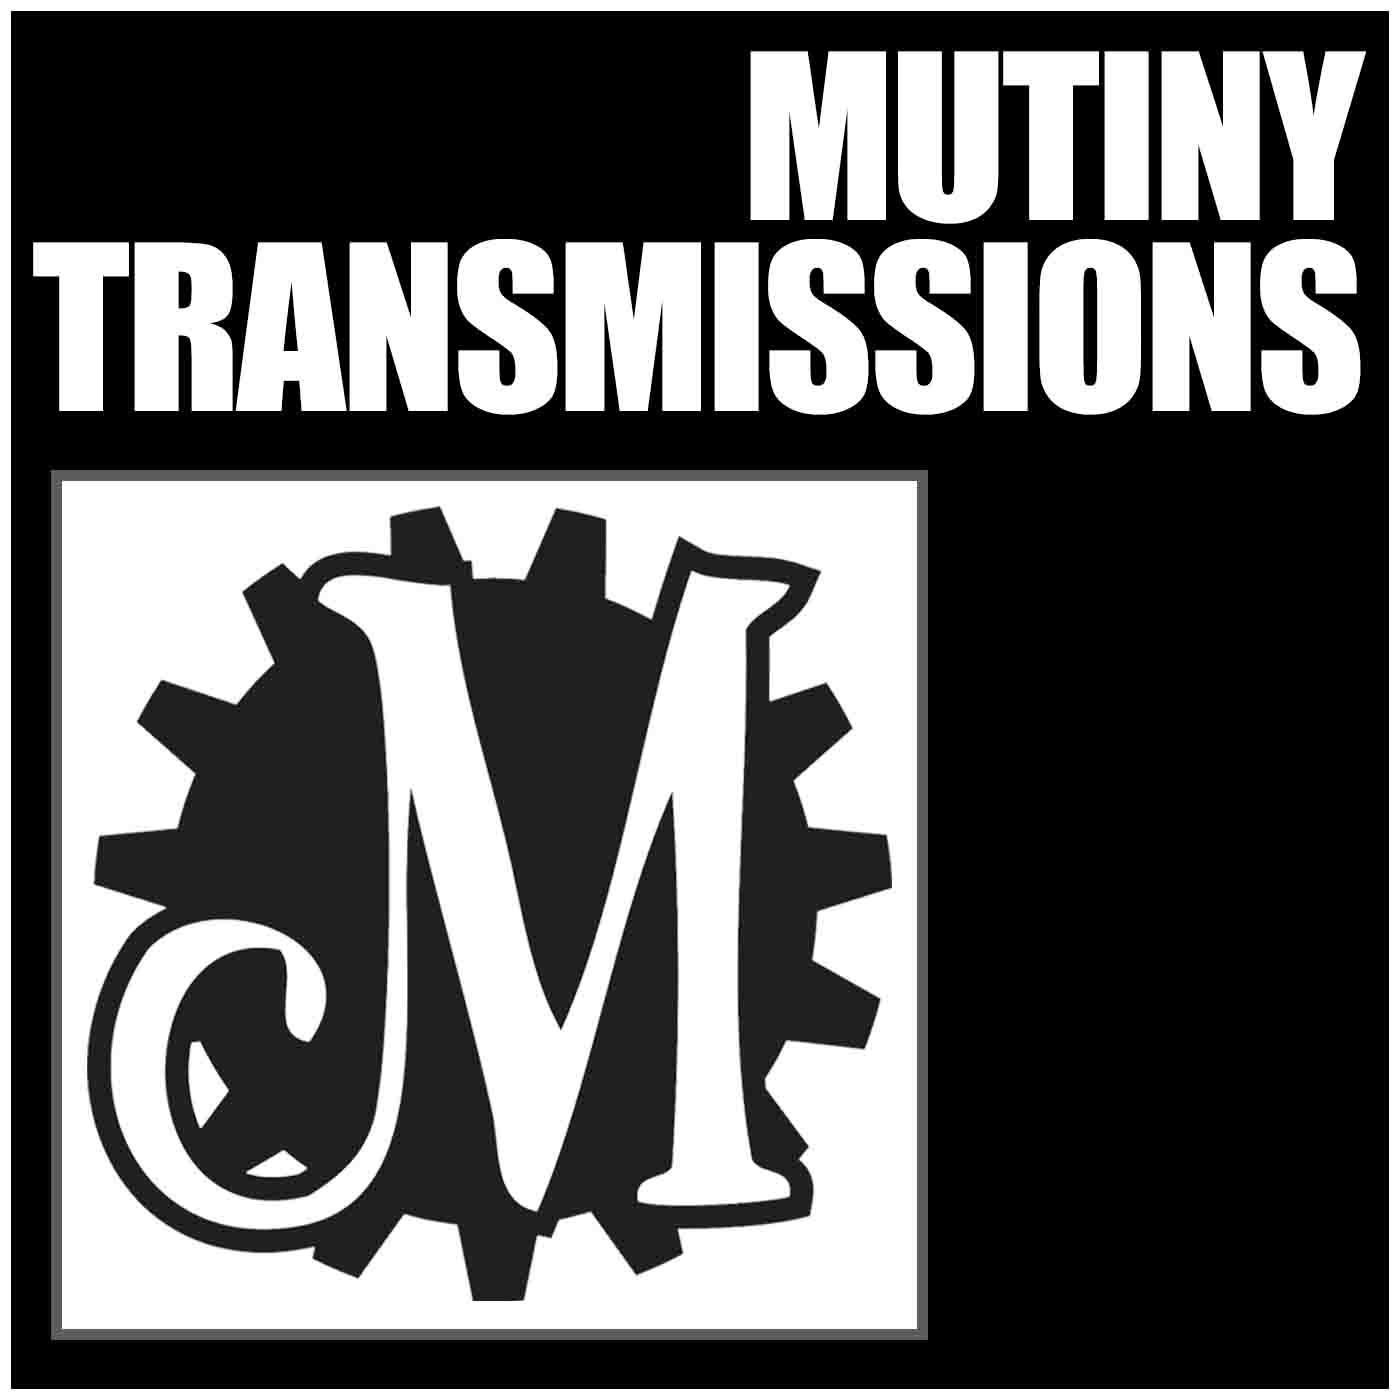 Mutiny Transmissions Podcasts show art